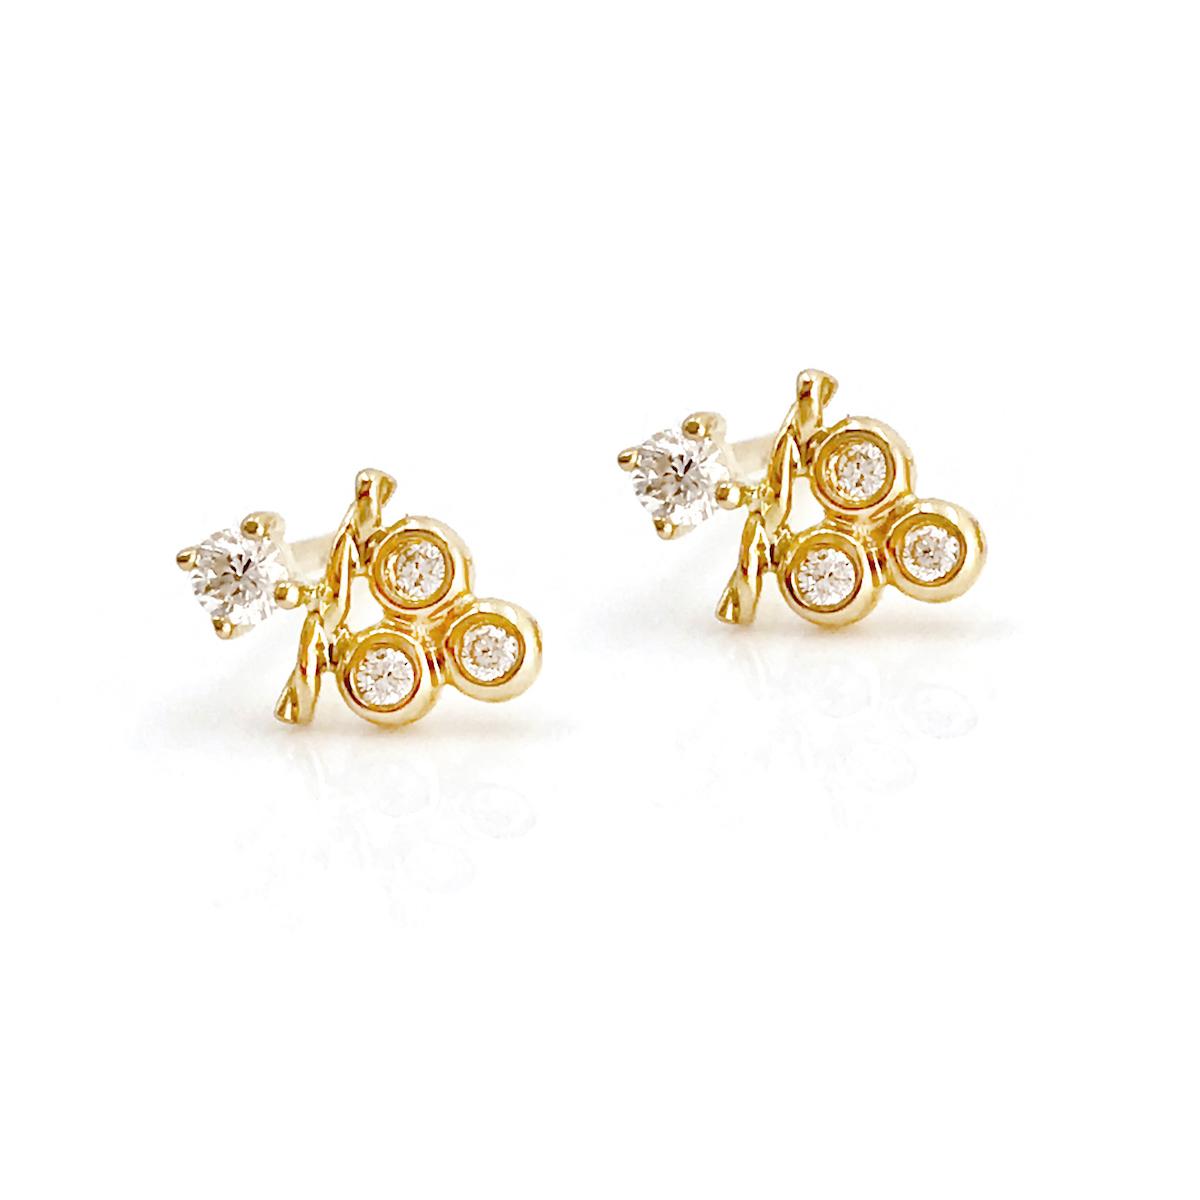 18k-Gold-Petite-Diamond-Cluster-Stud-Earrings